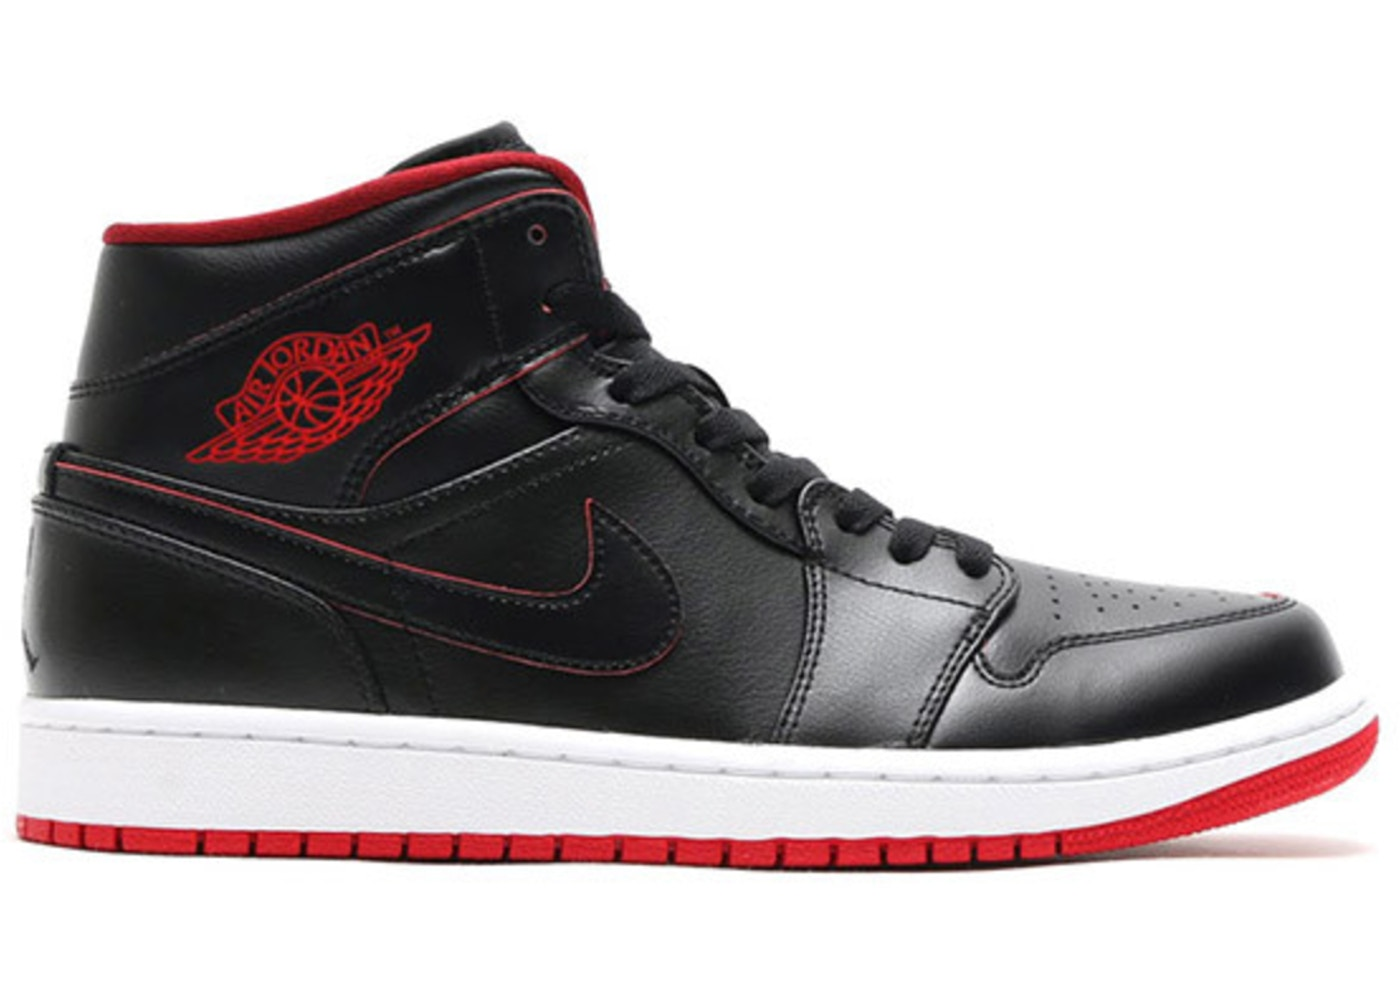 Jordan 1 Retro Mid Black Red White